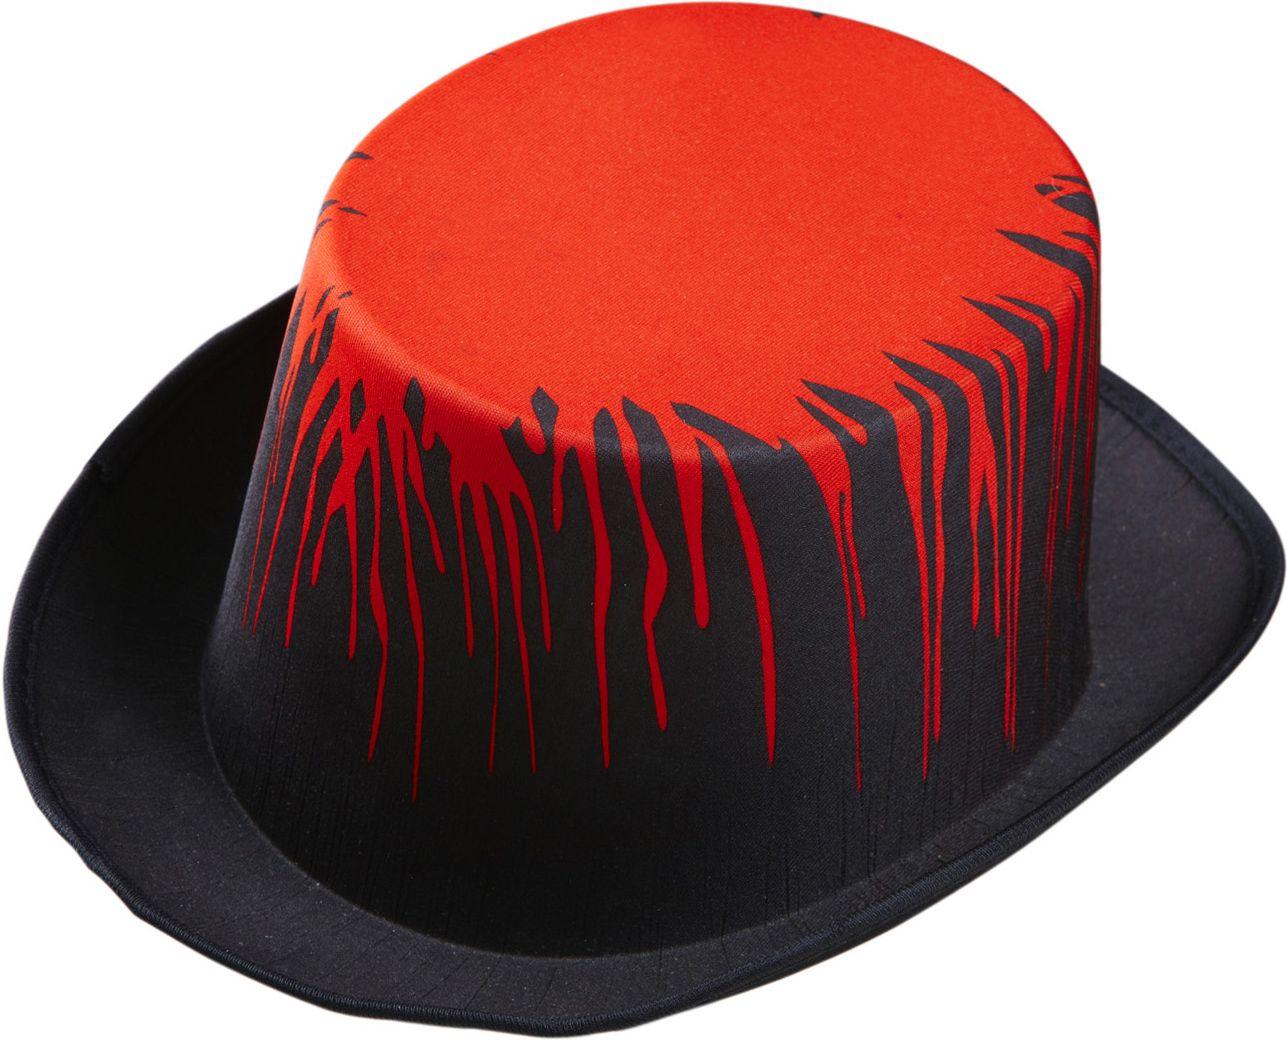 Bloederige hoge hoed